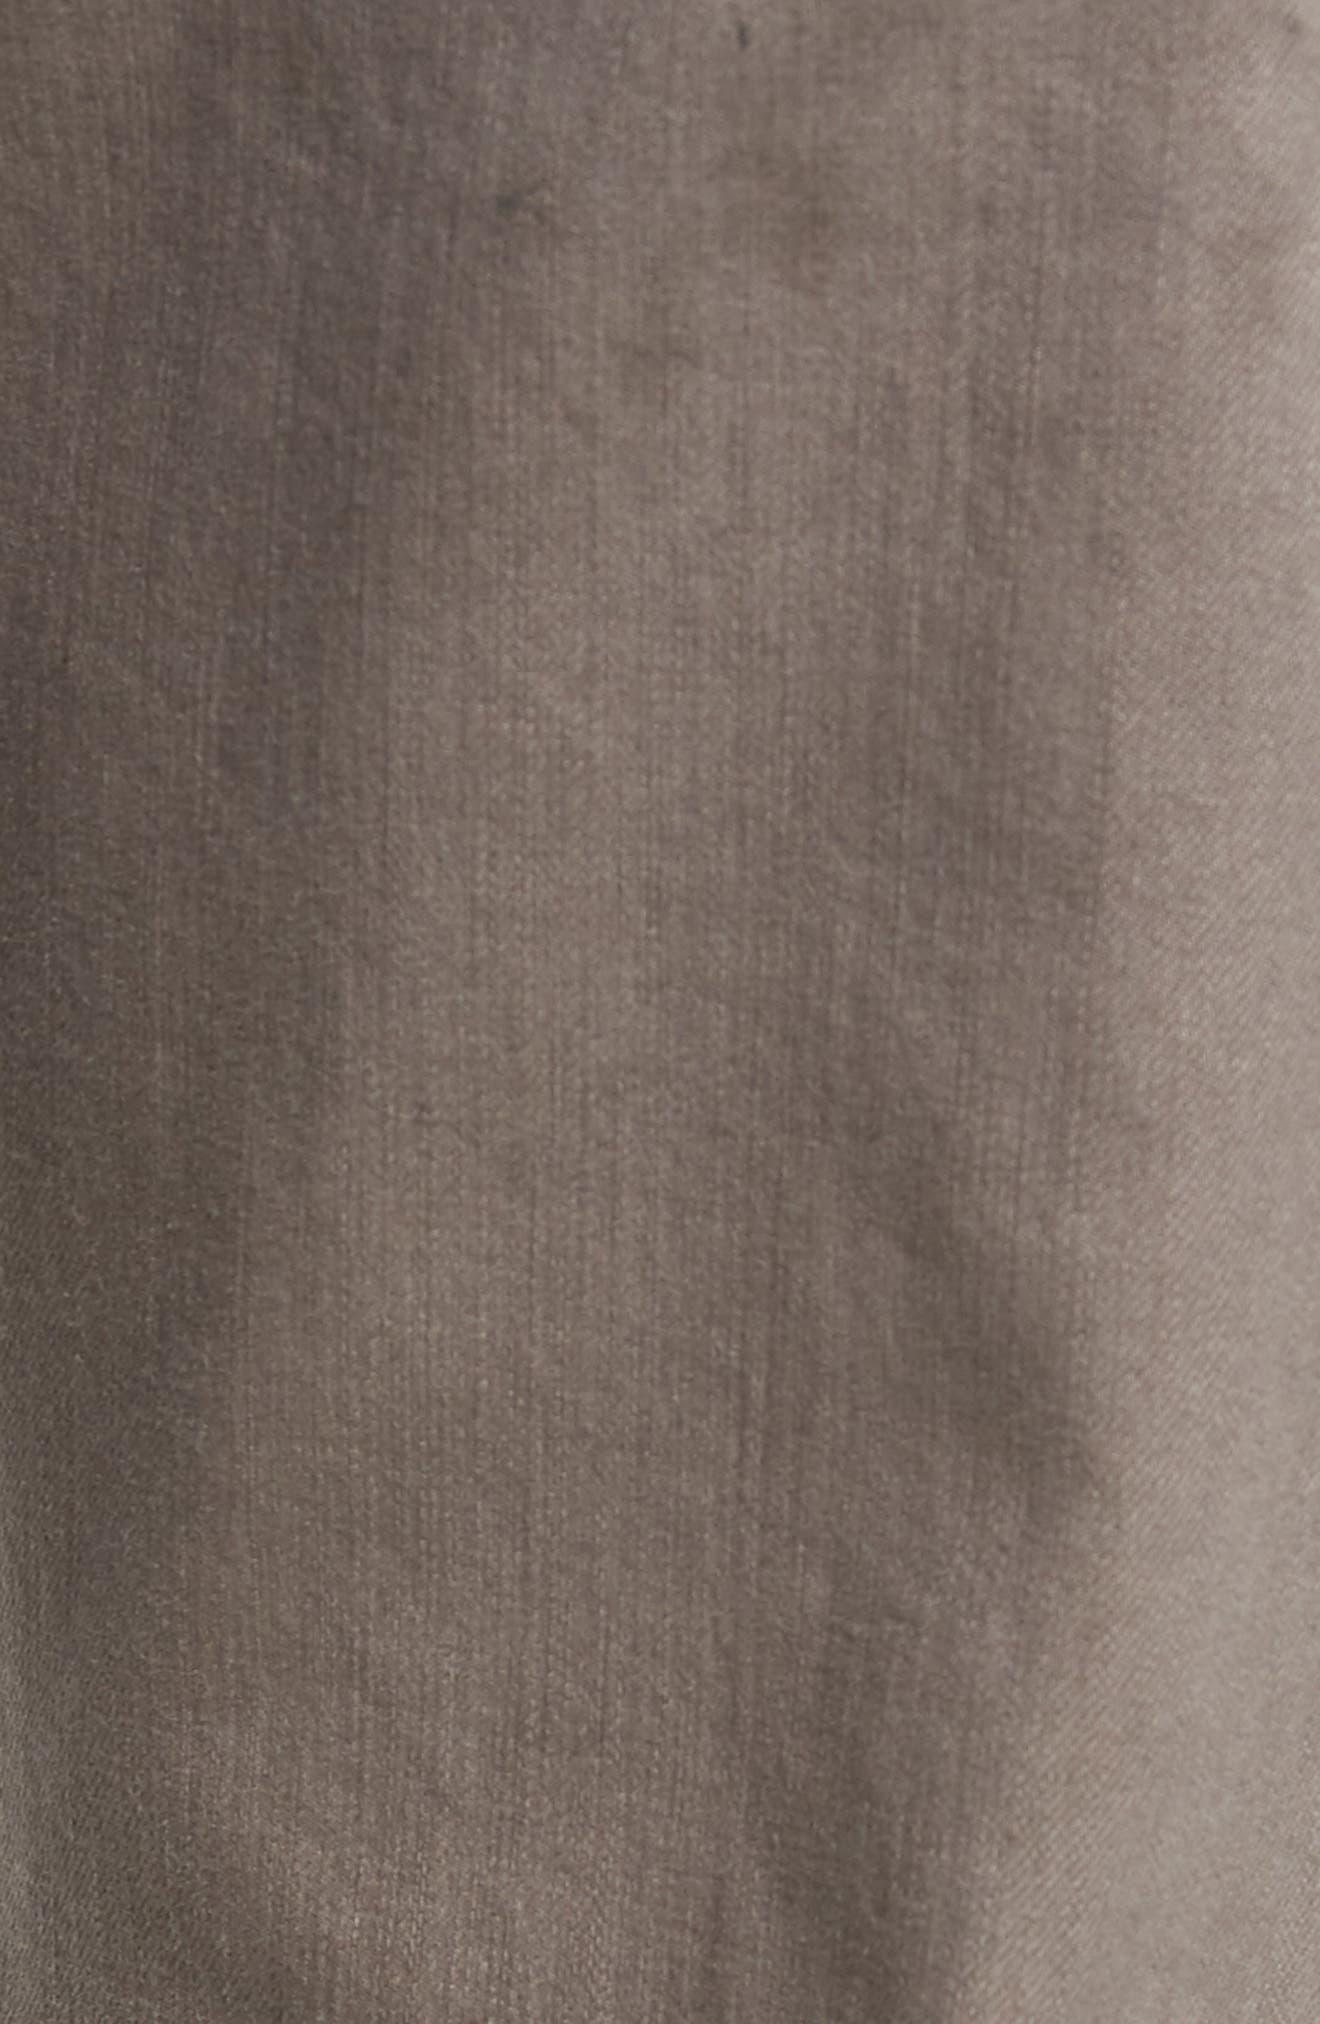 Jimmy Slim Straight Leg Jeans,                             Alternate thumbnail 5, color,                             020